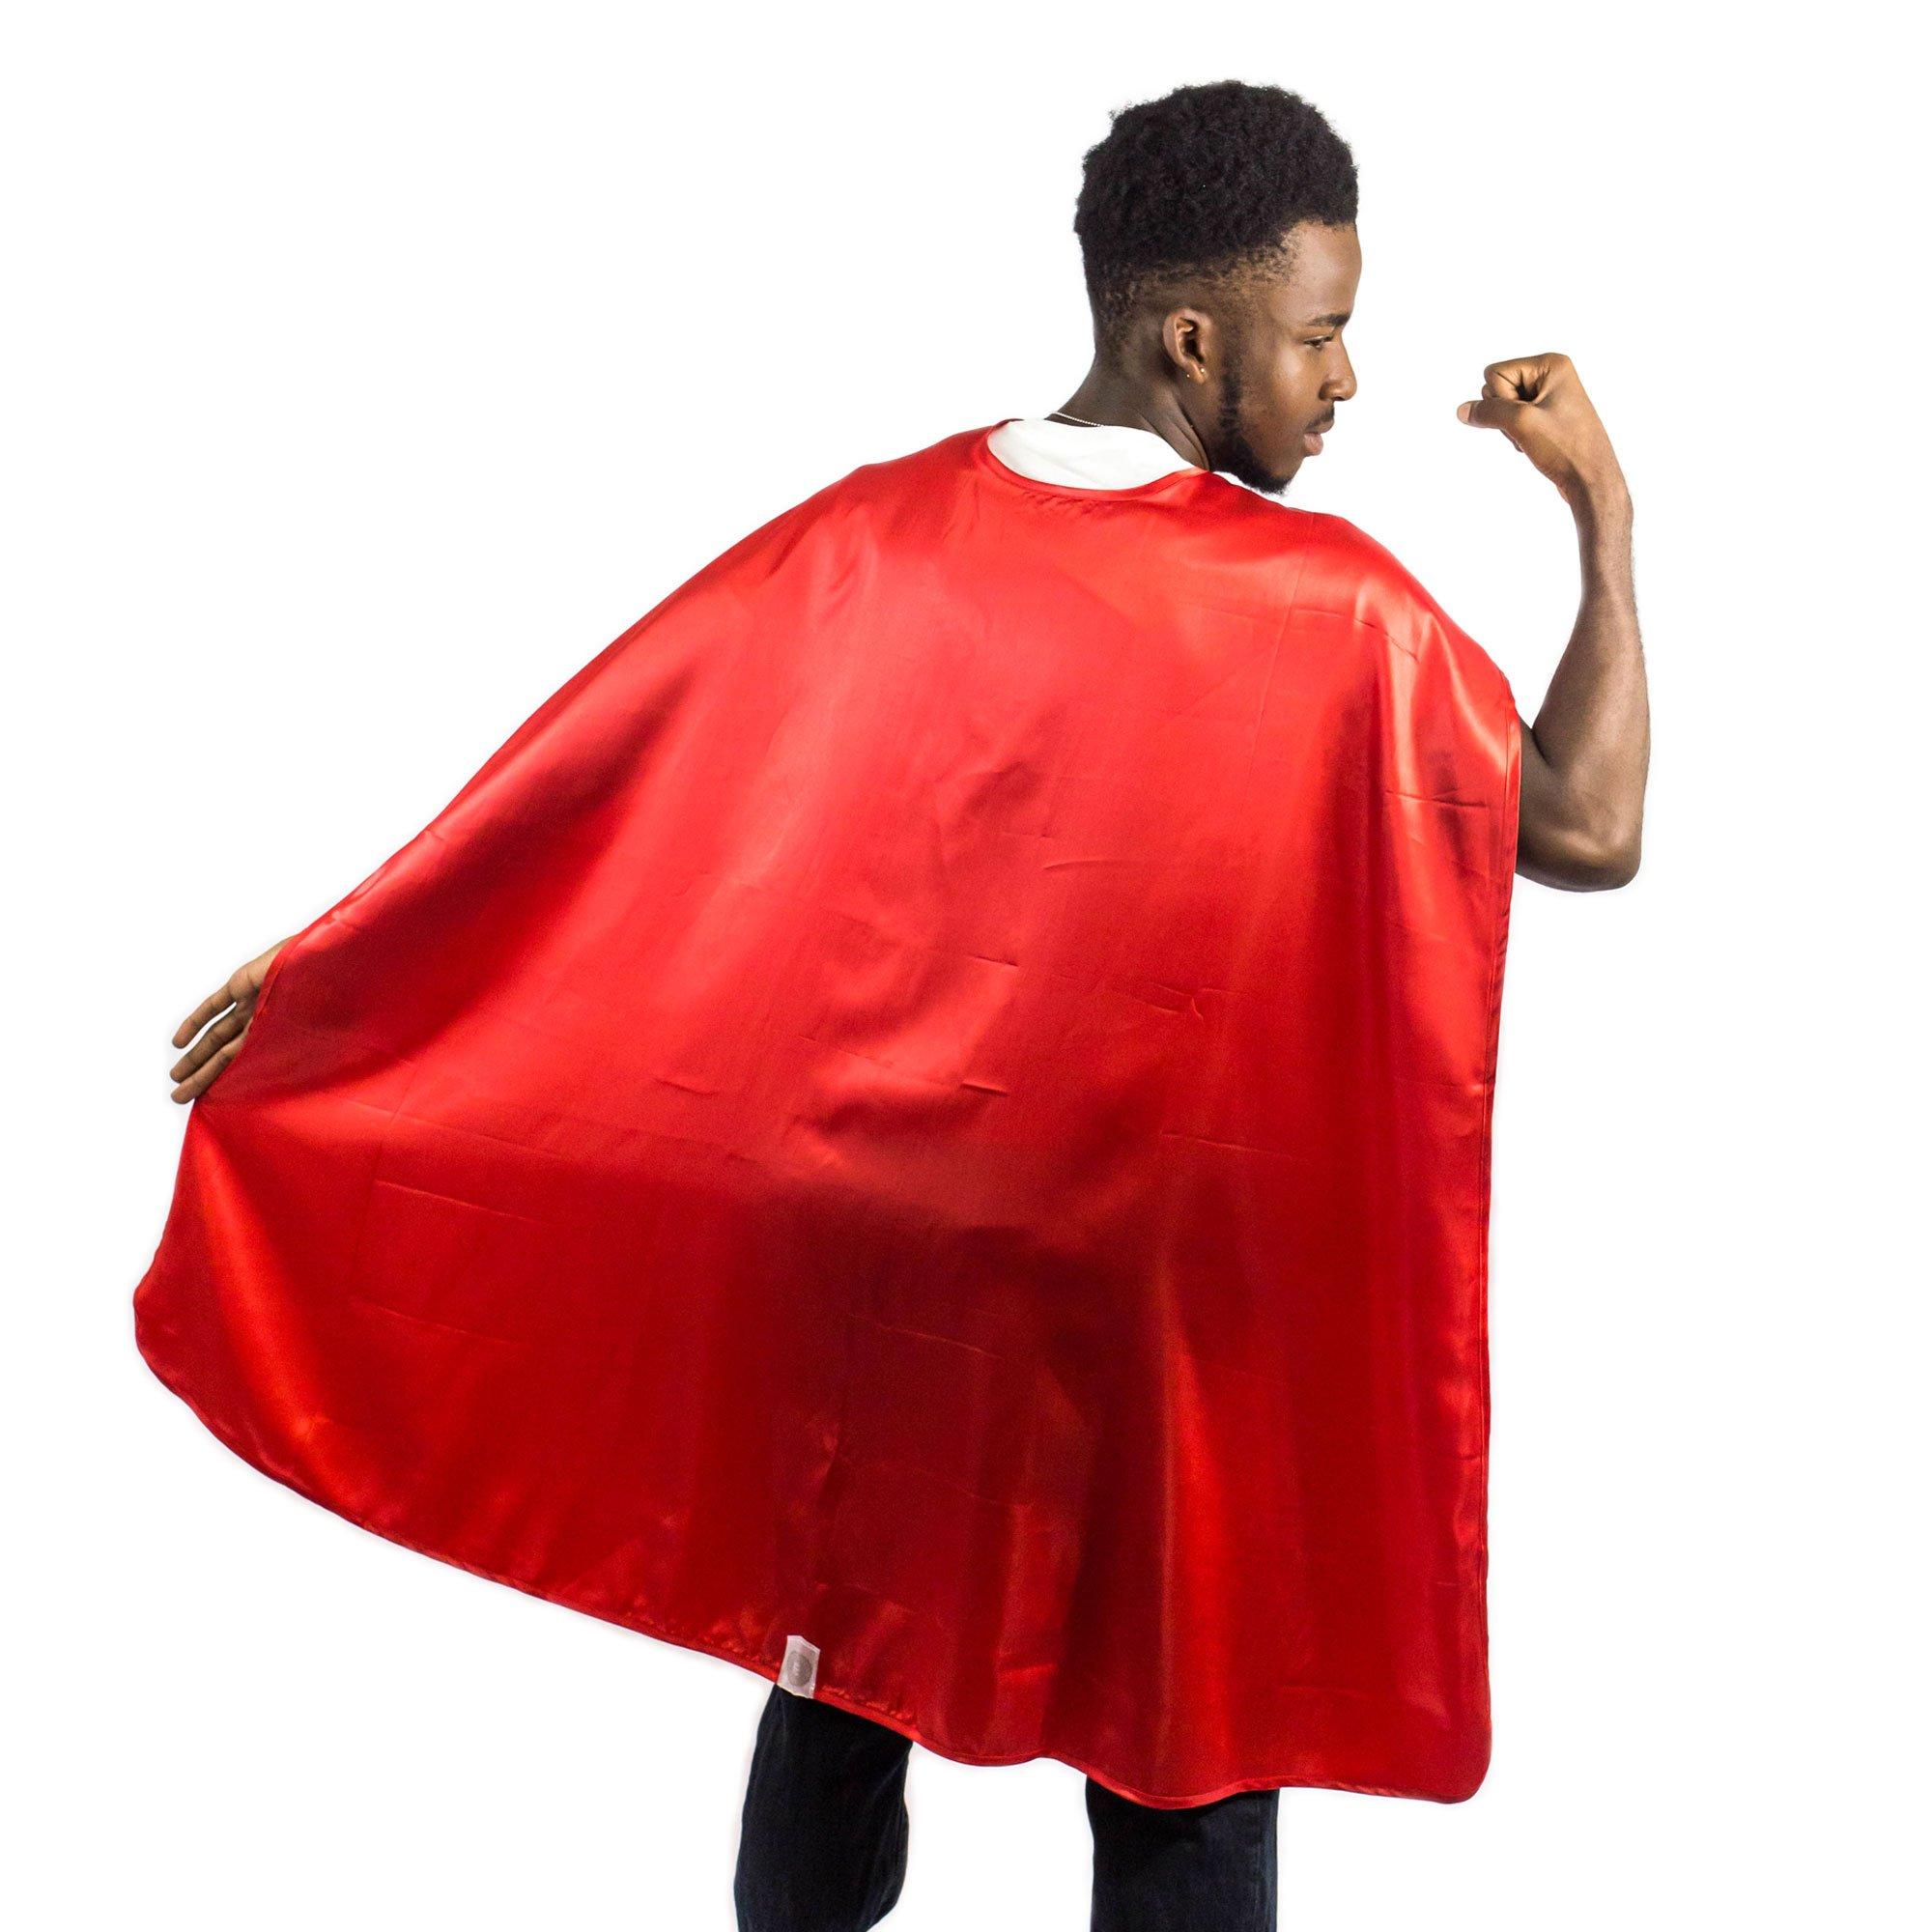 Everfan Men's Polyester Satin Superhero Cape 38'' LX48 W Red